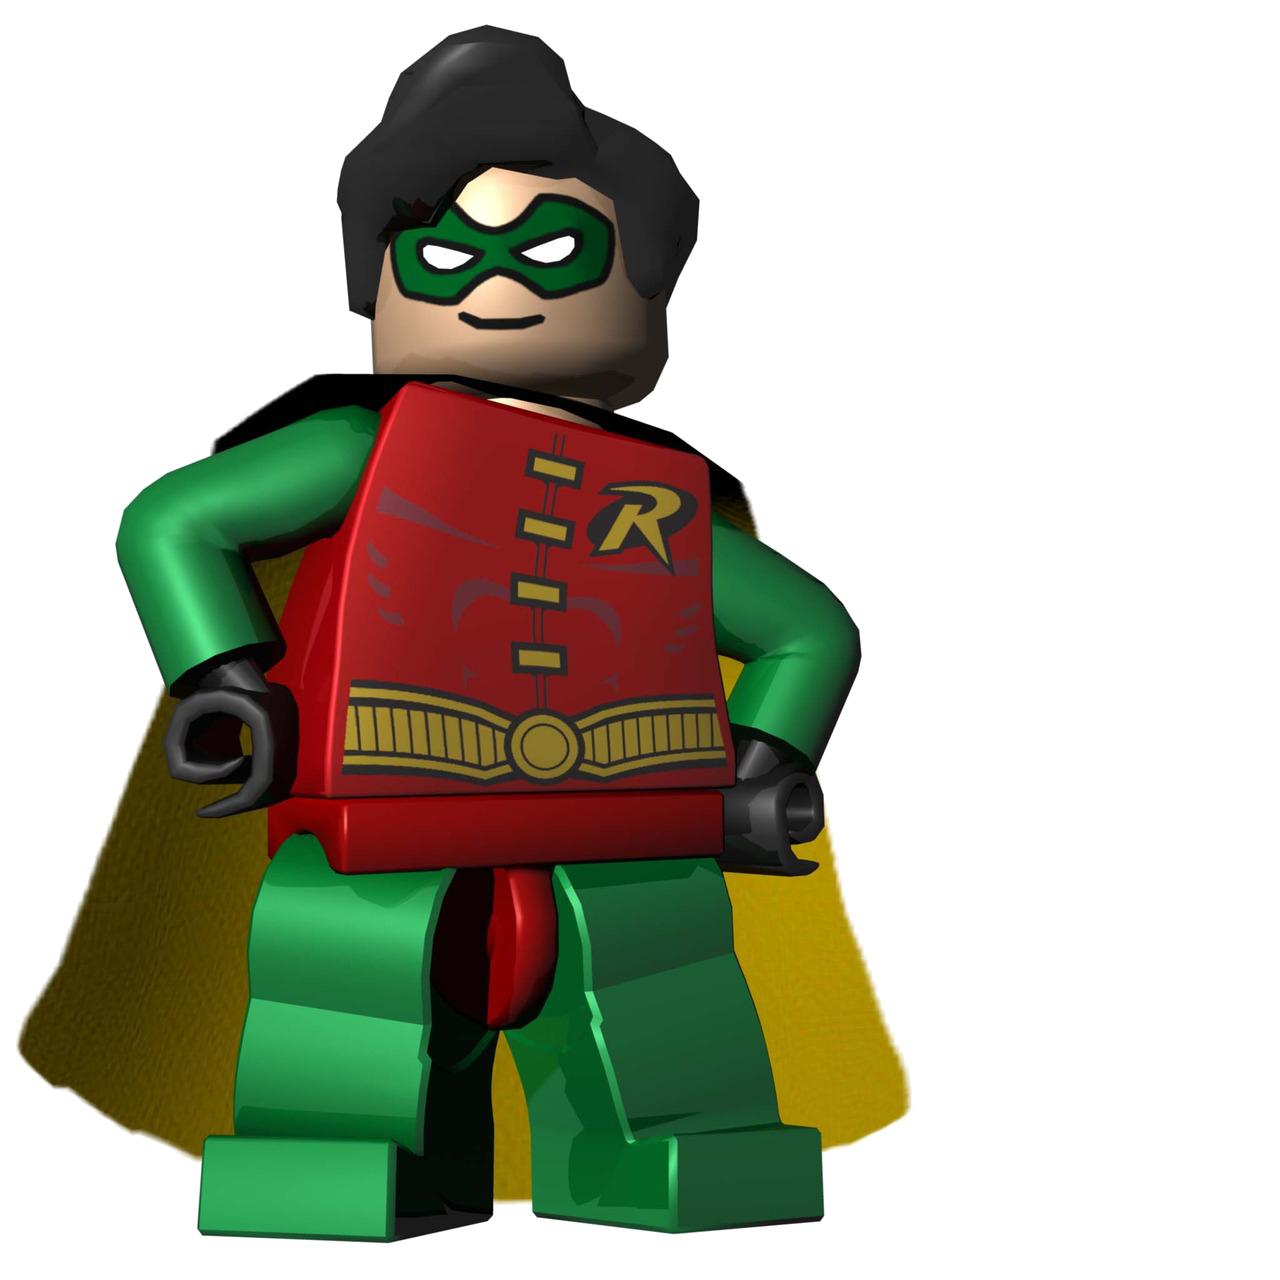 1280x1280 Batman Lego Clipart Free Images